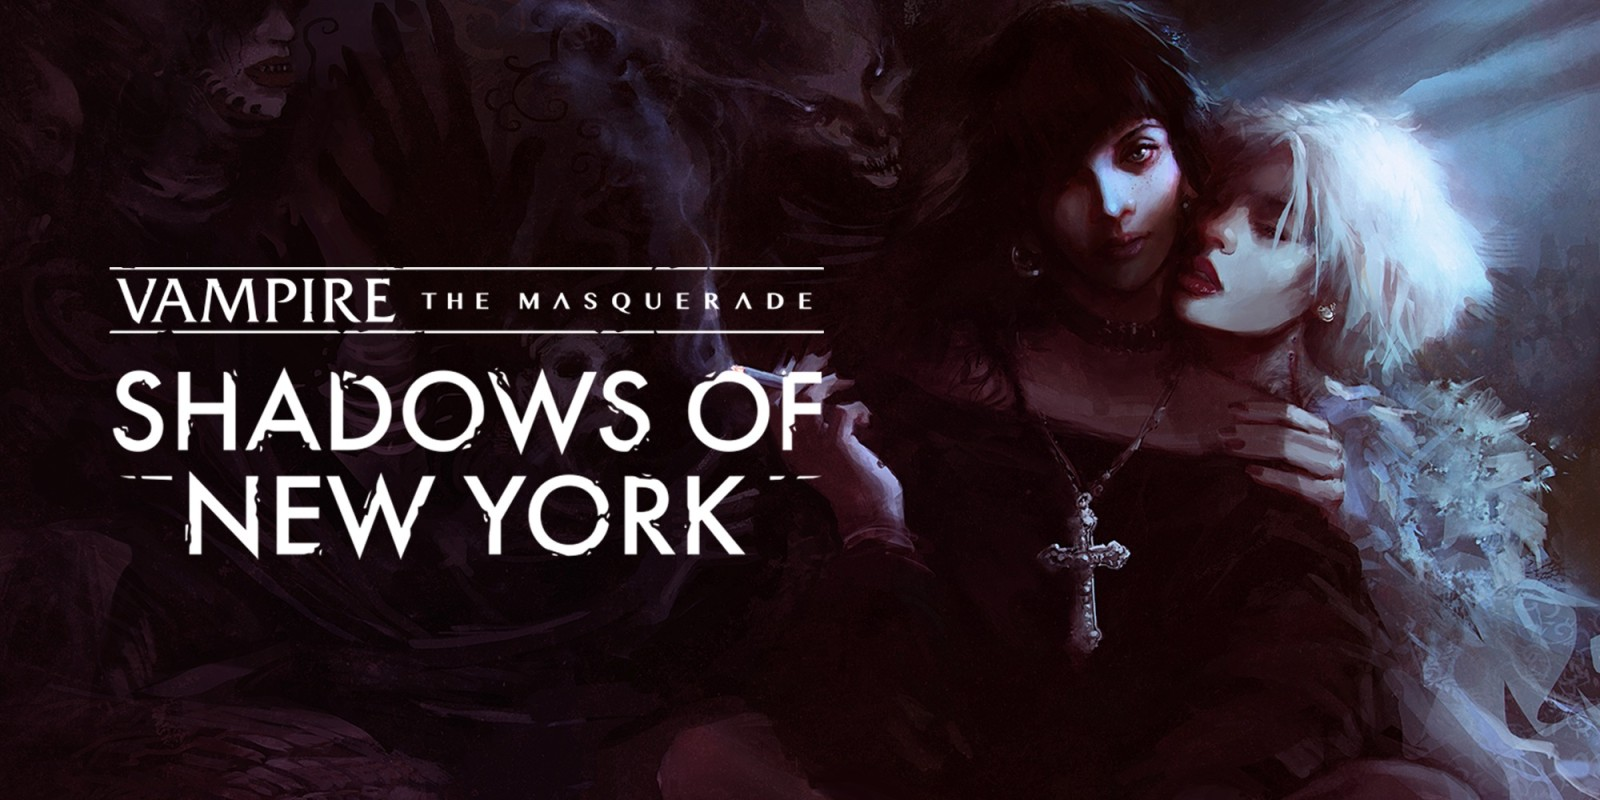 Vampire: Shadows of New York, l'épisode 2